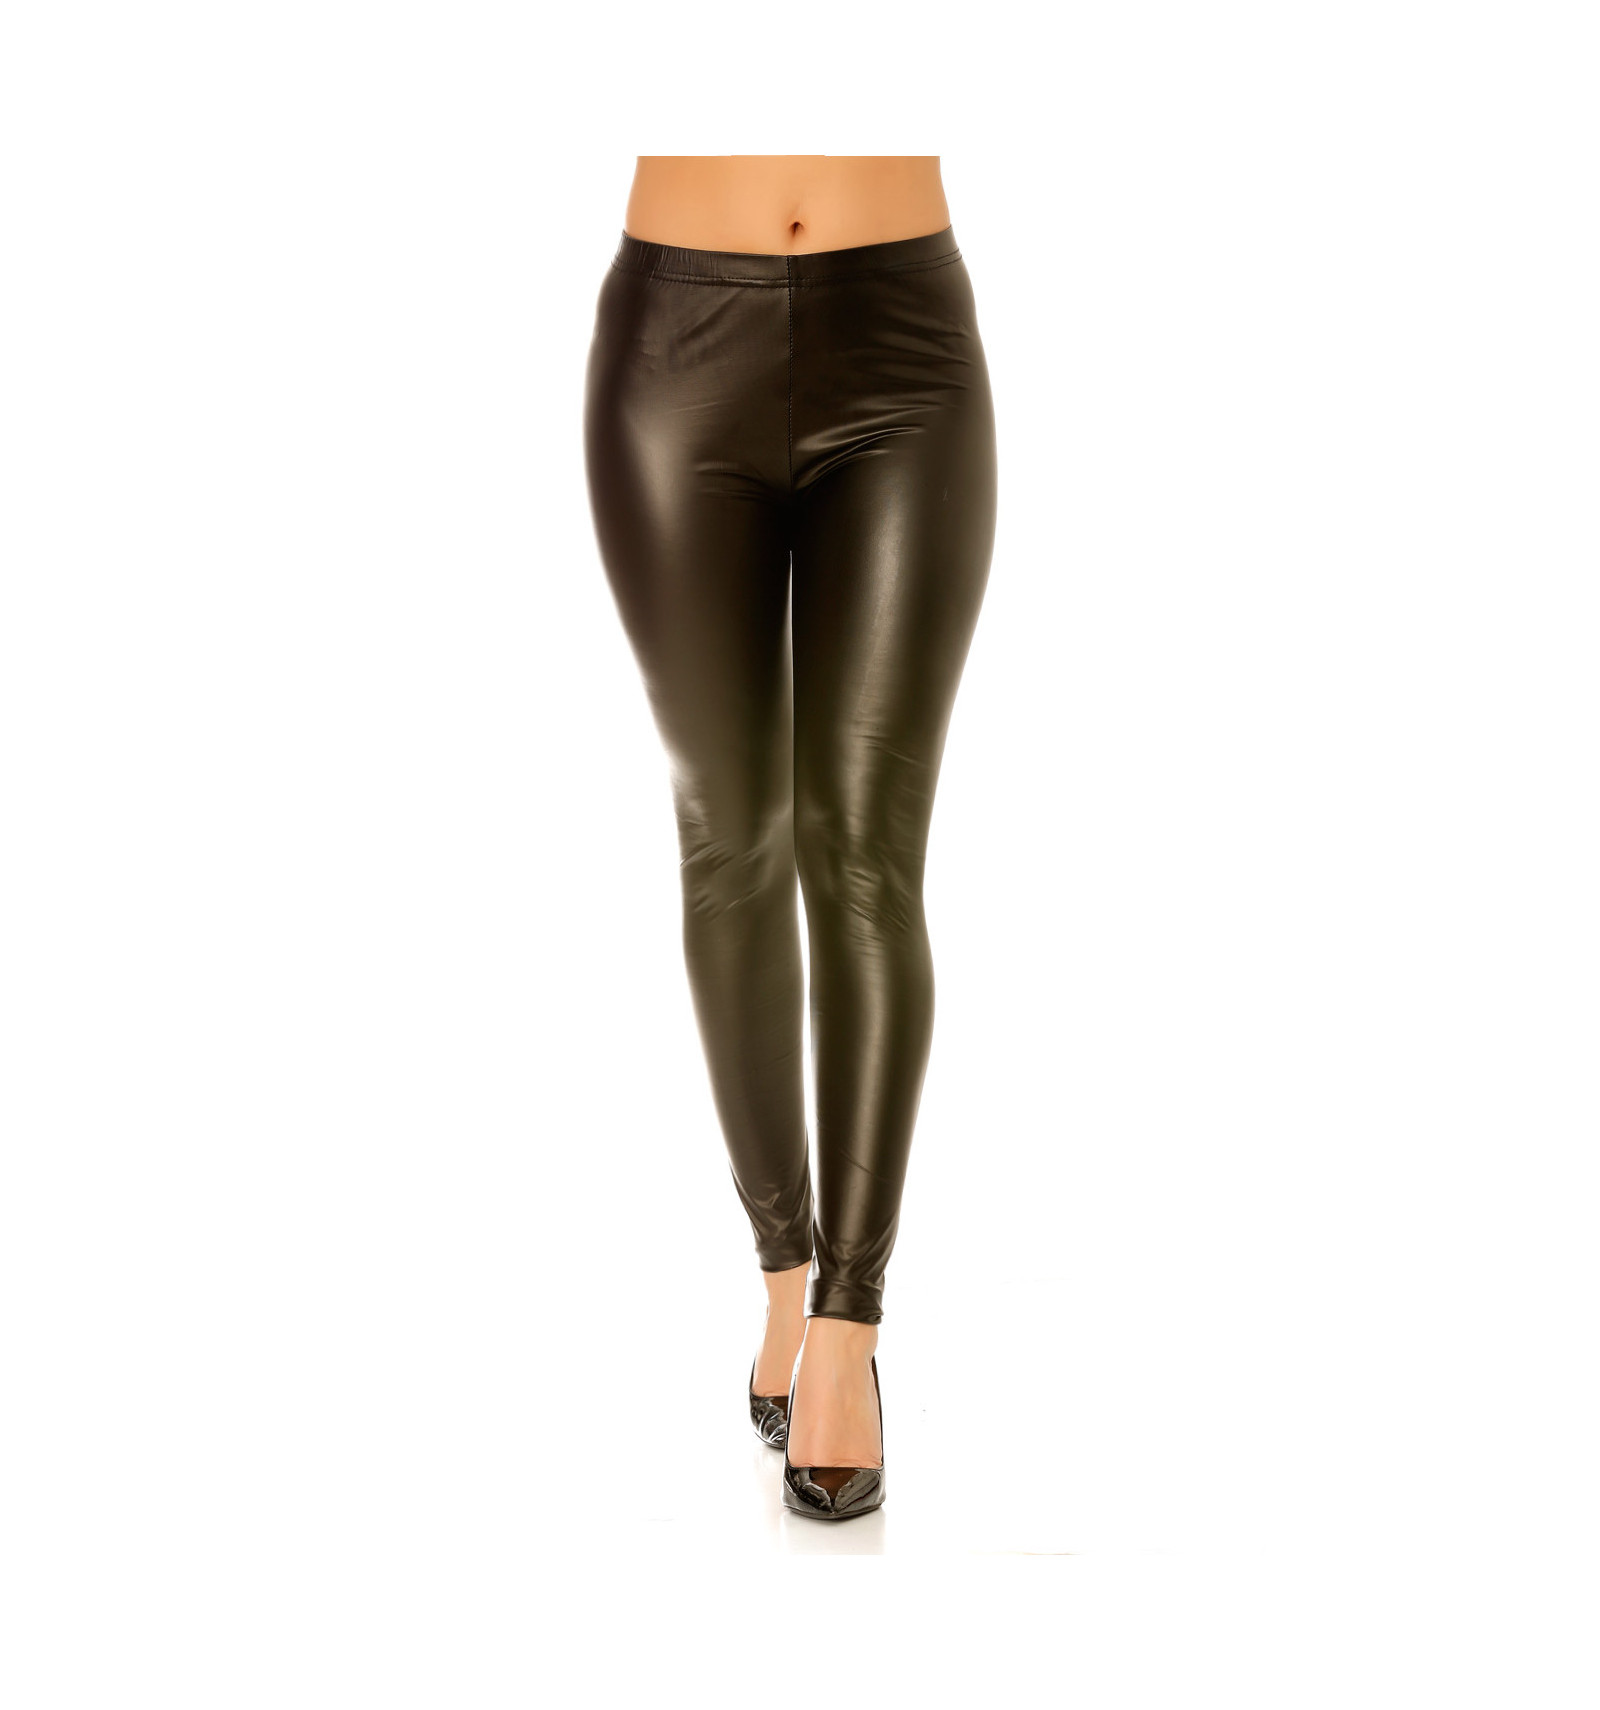 Neuf sous emballage danskin STRETCHFIT Cheville Leggings Taille XL